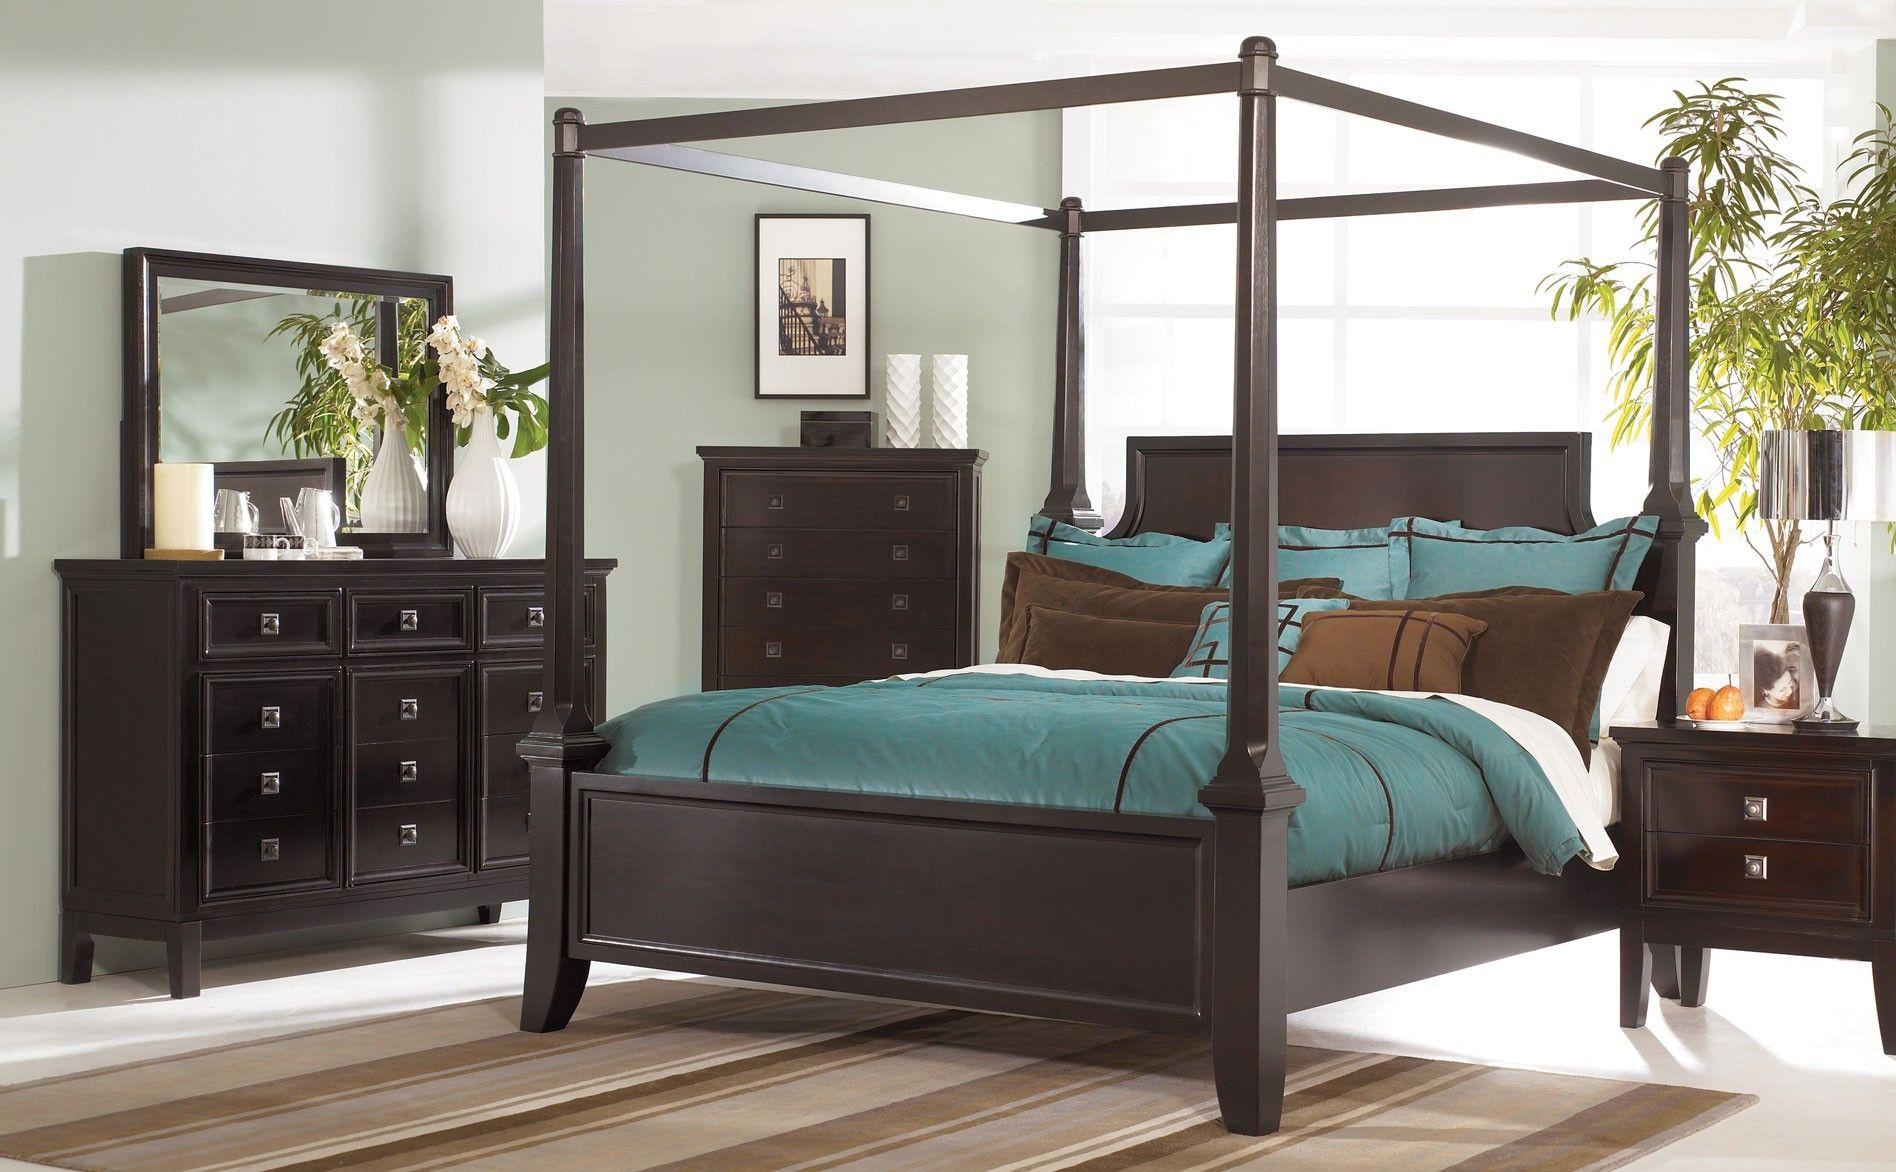 Black Wood Canopy Bedroom Sets   Canopy bedroom sets ...